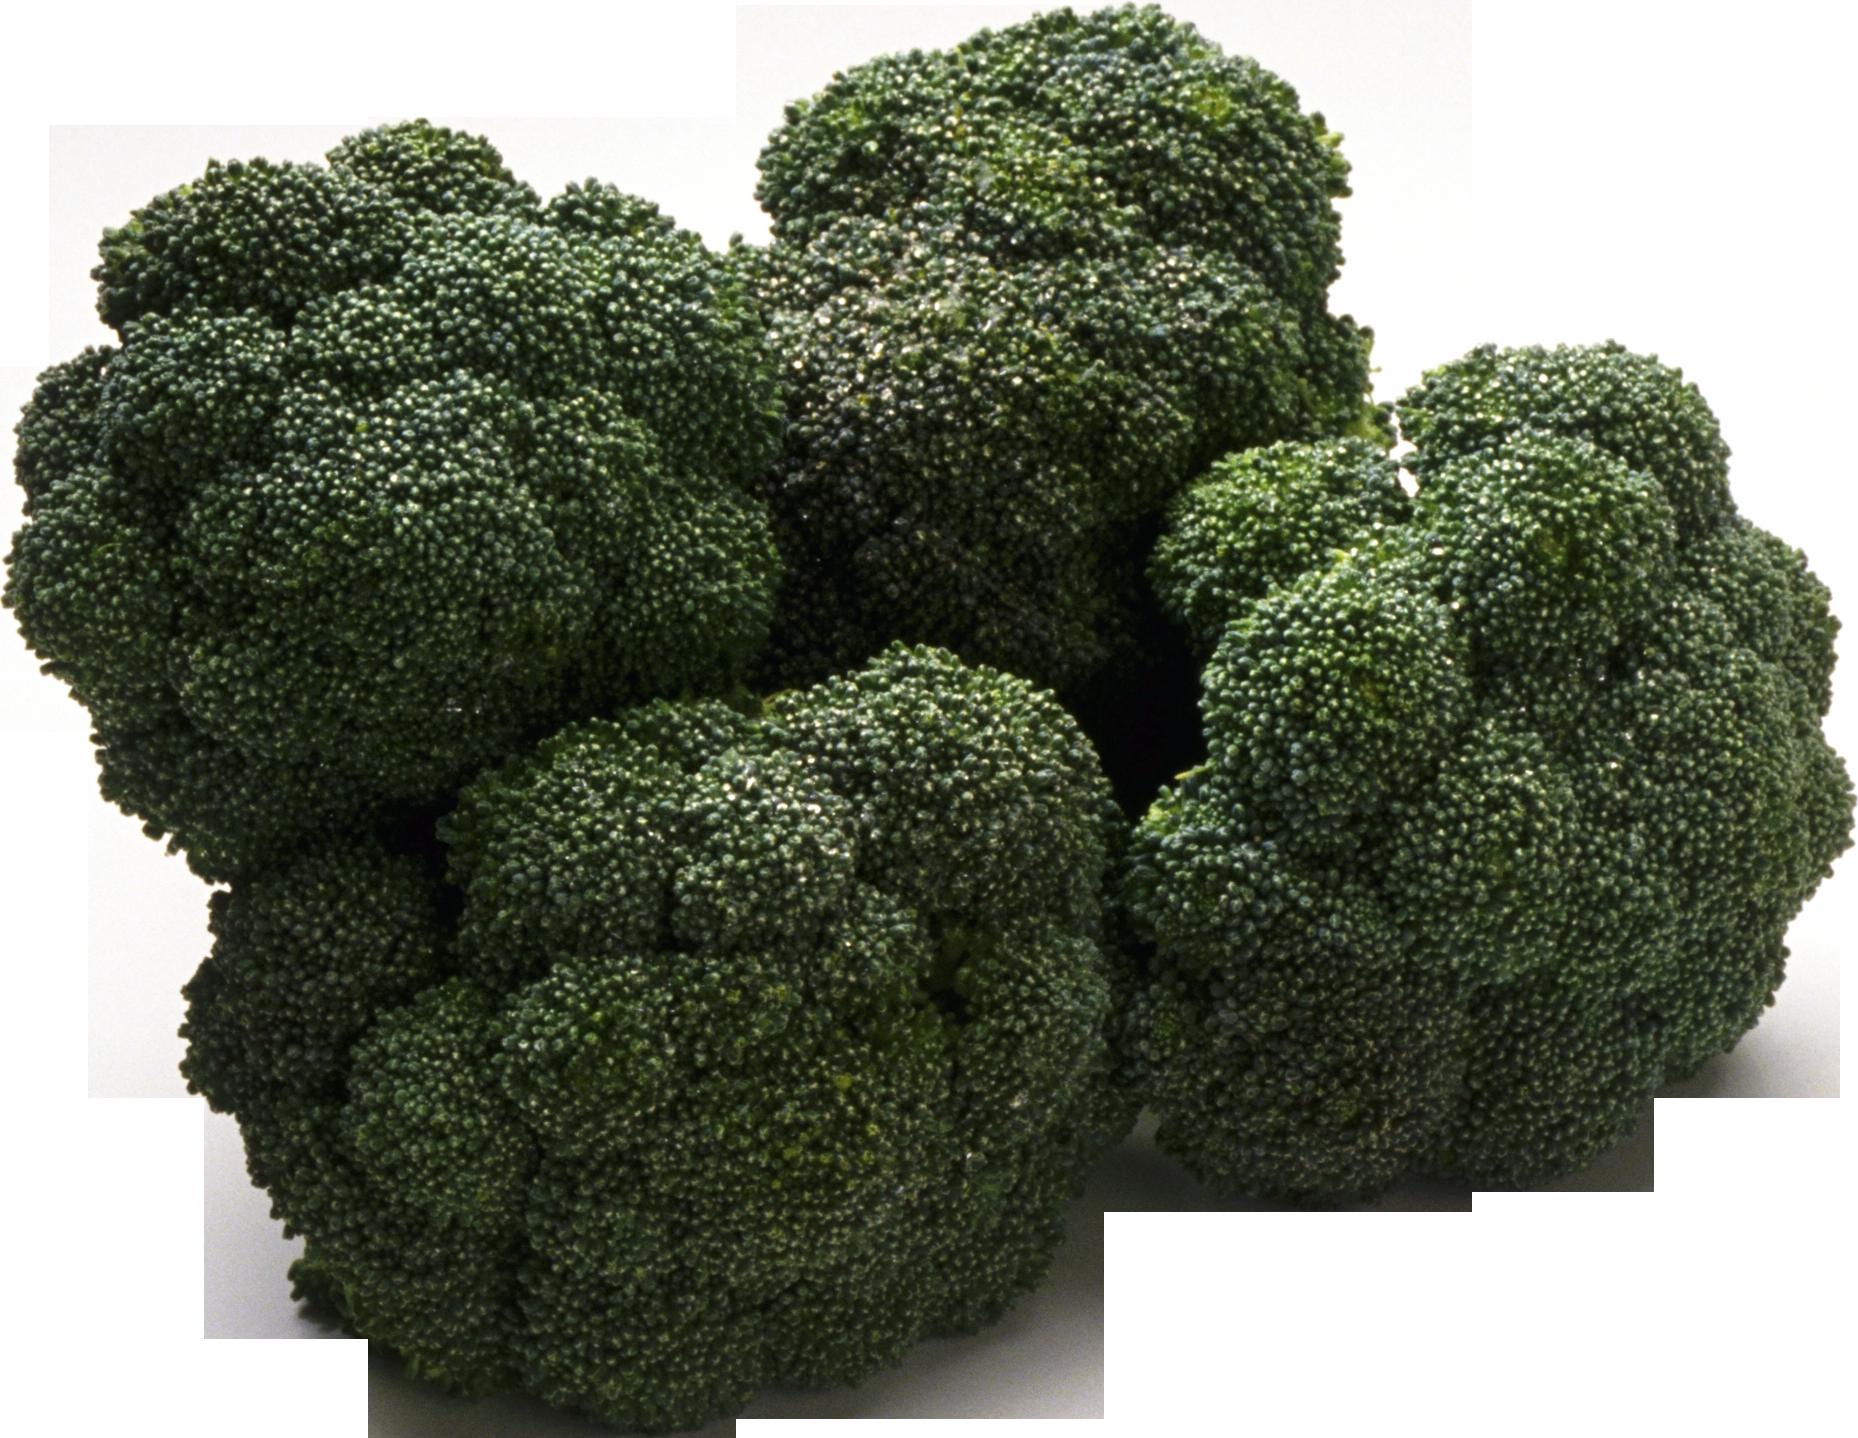 free Broccoli PNG image